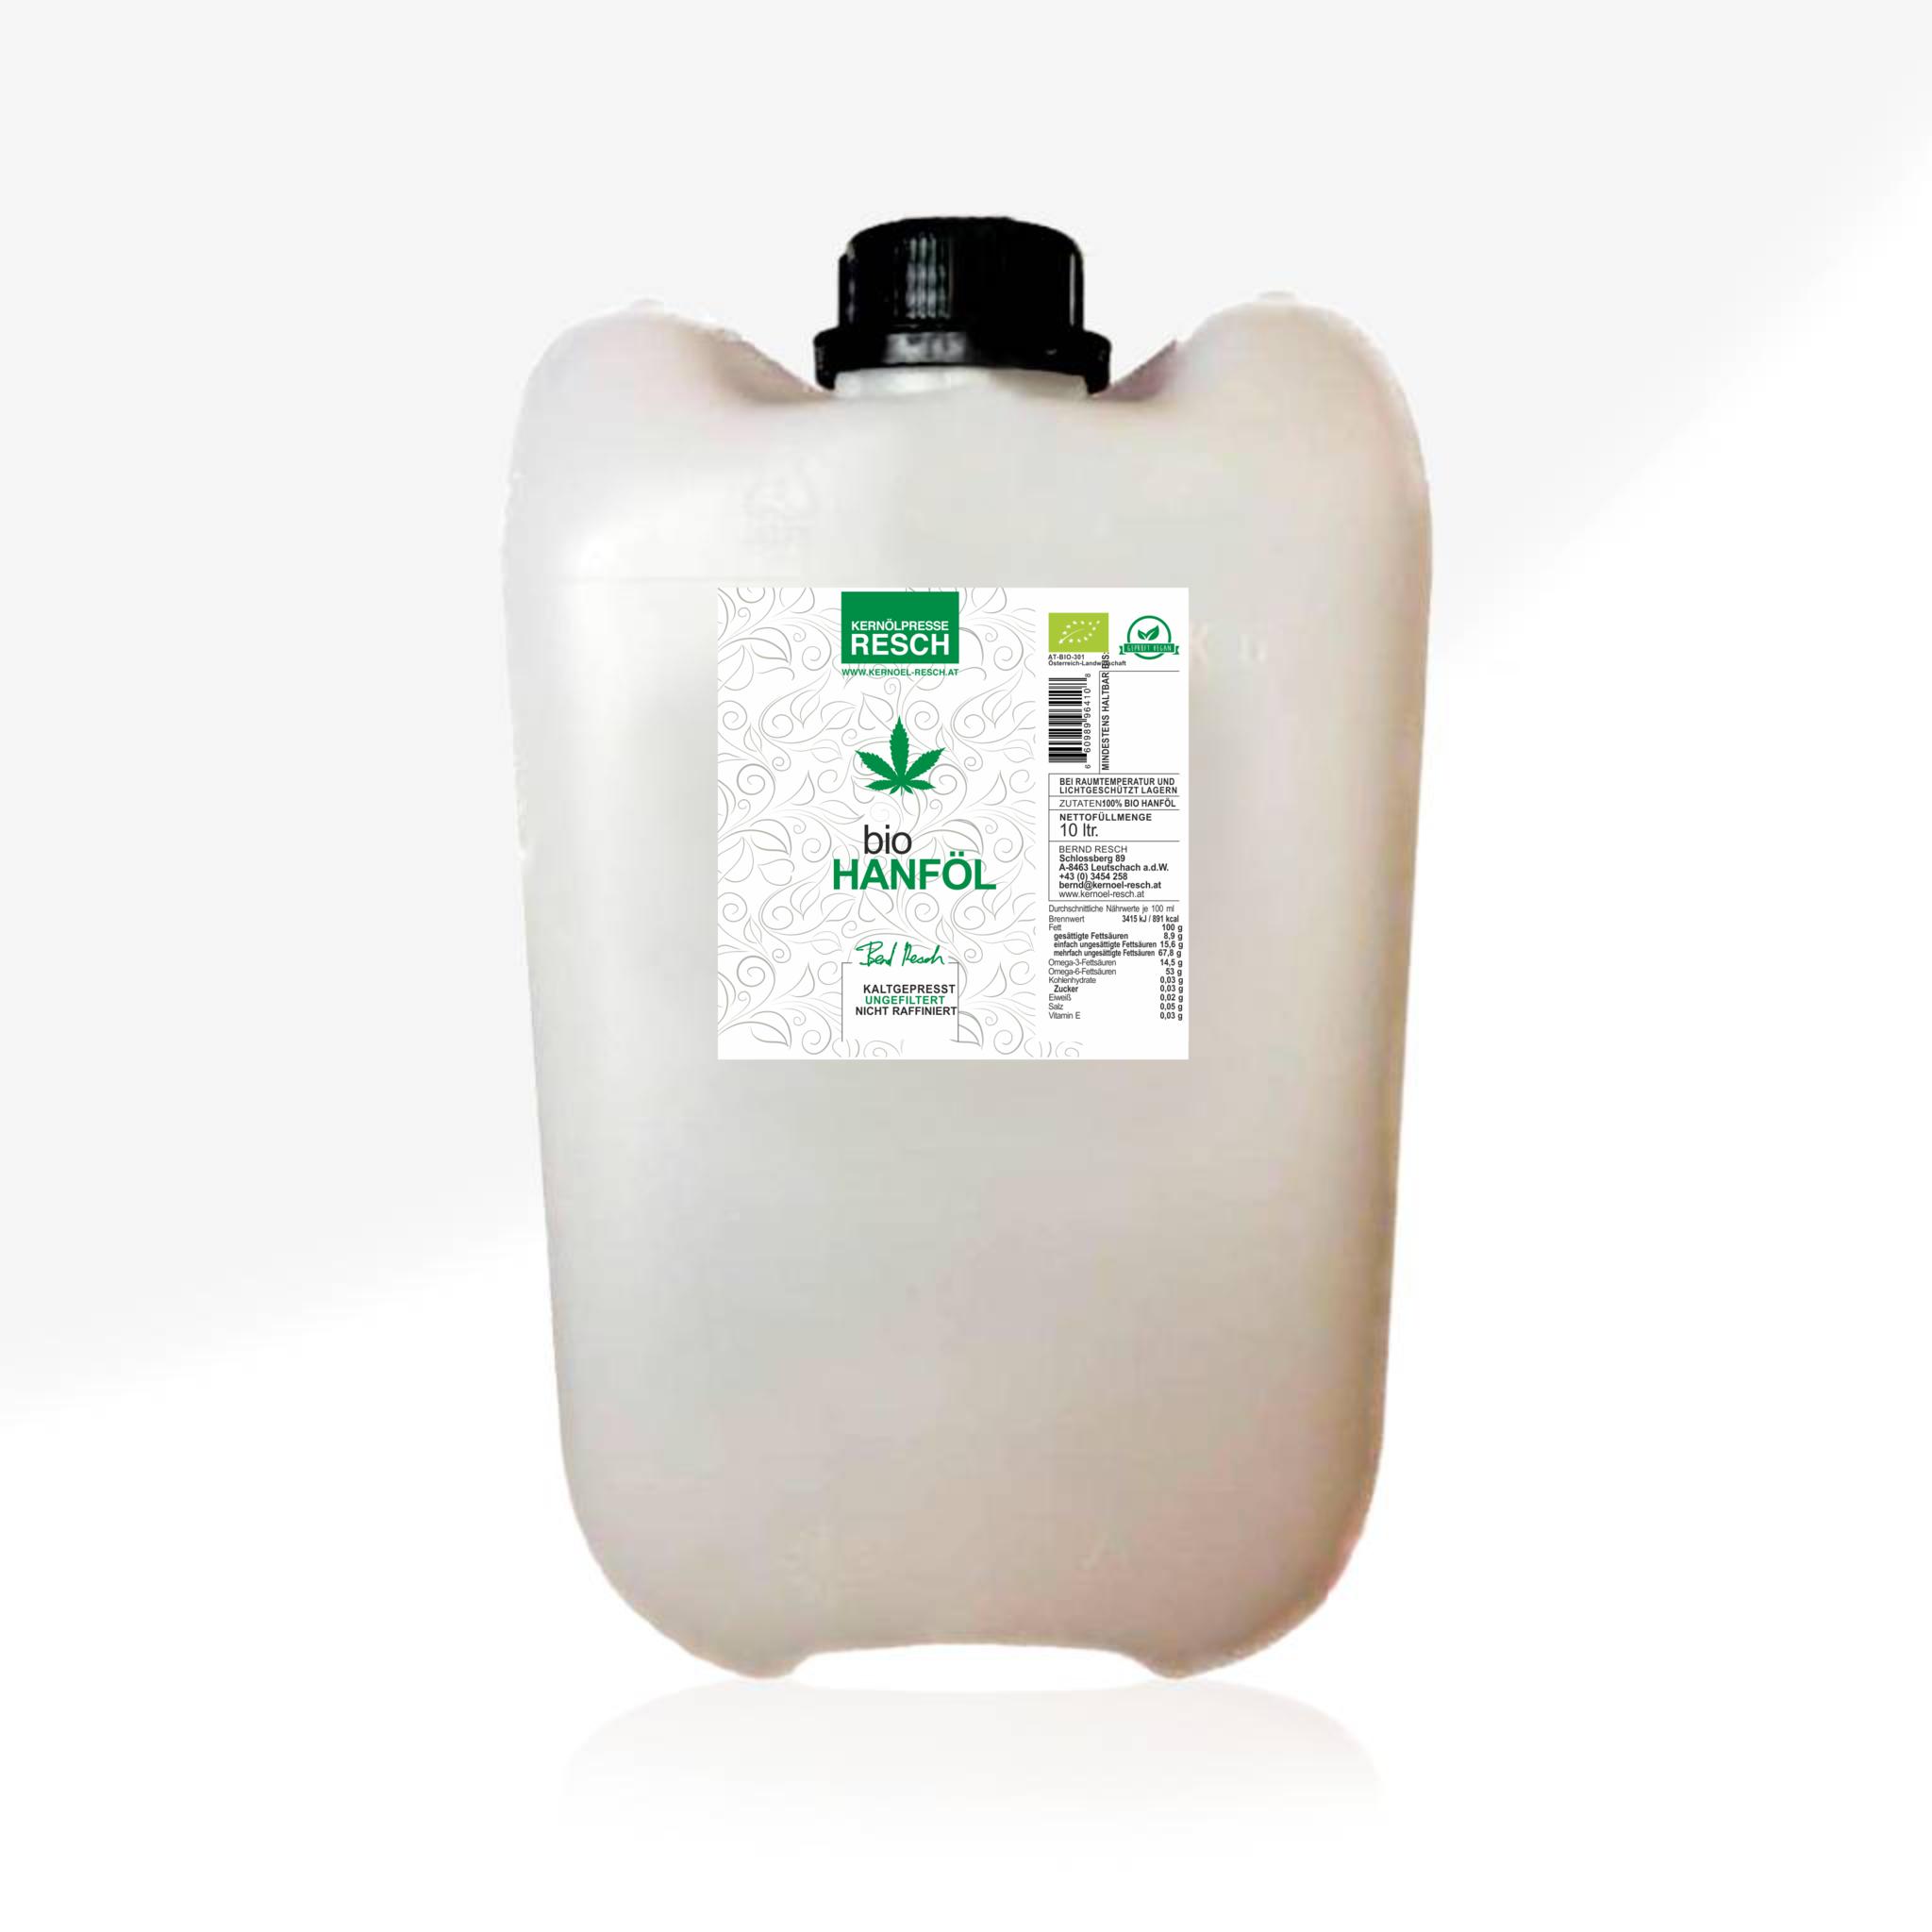 RESCH BIO Hanföl kaltgepresst AT BIO 301 - 10ltr. Kanister